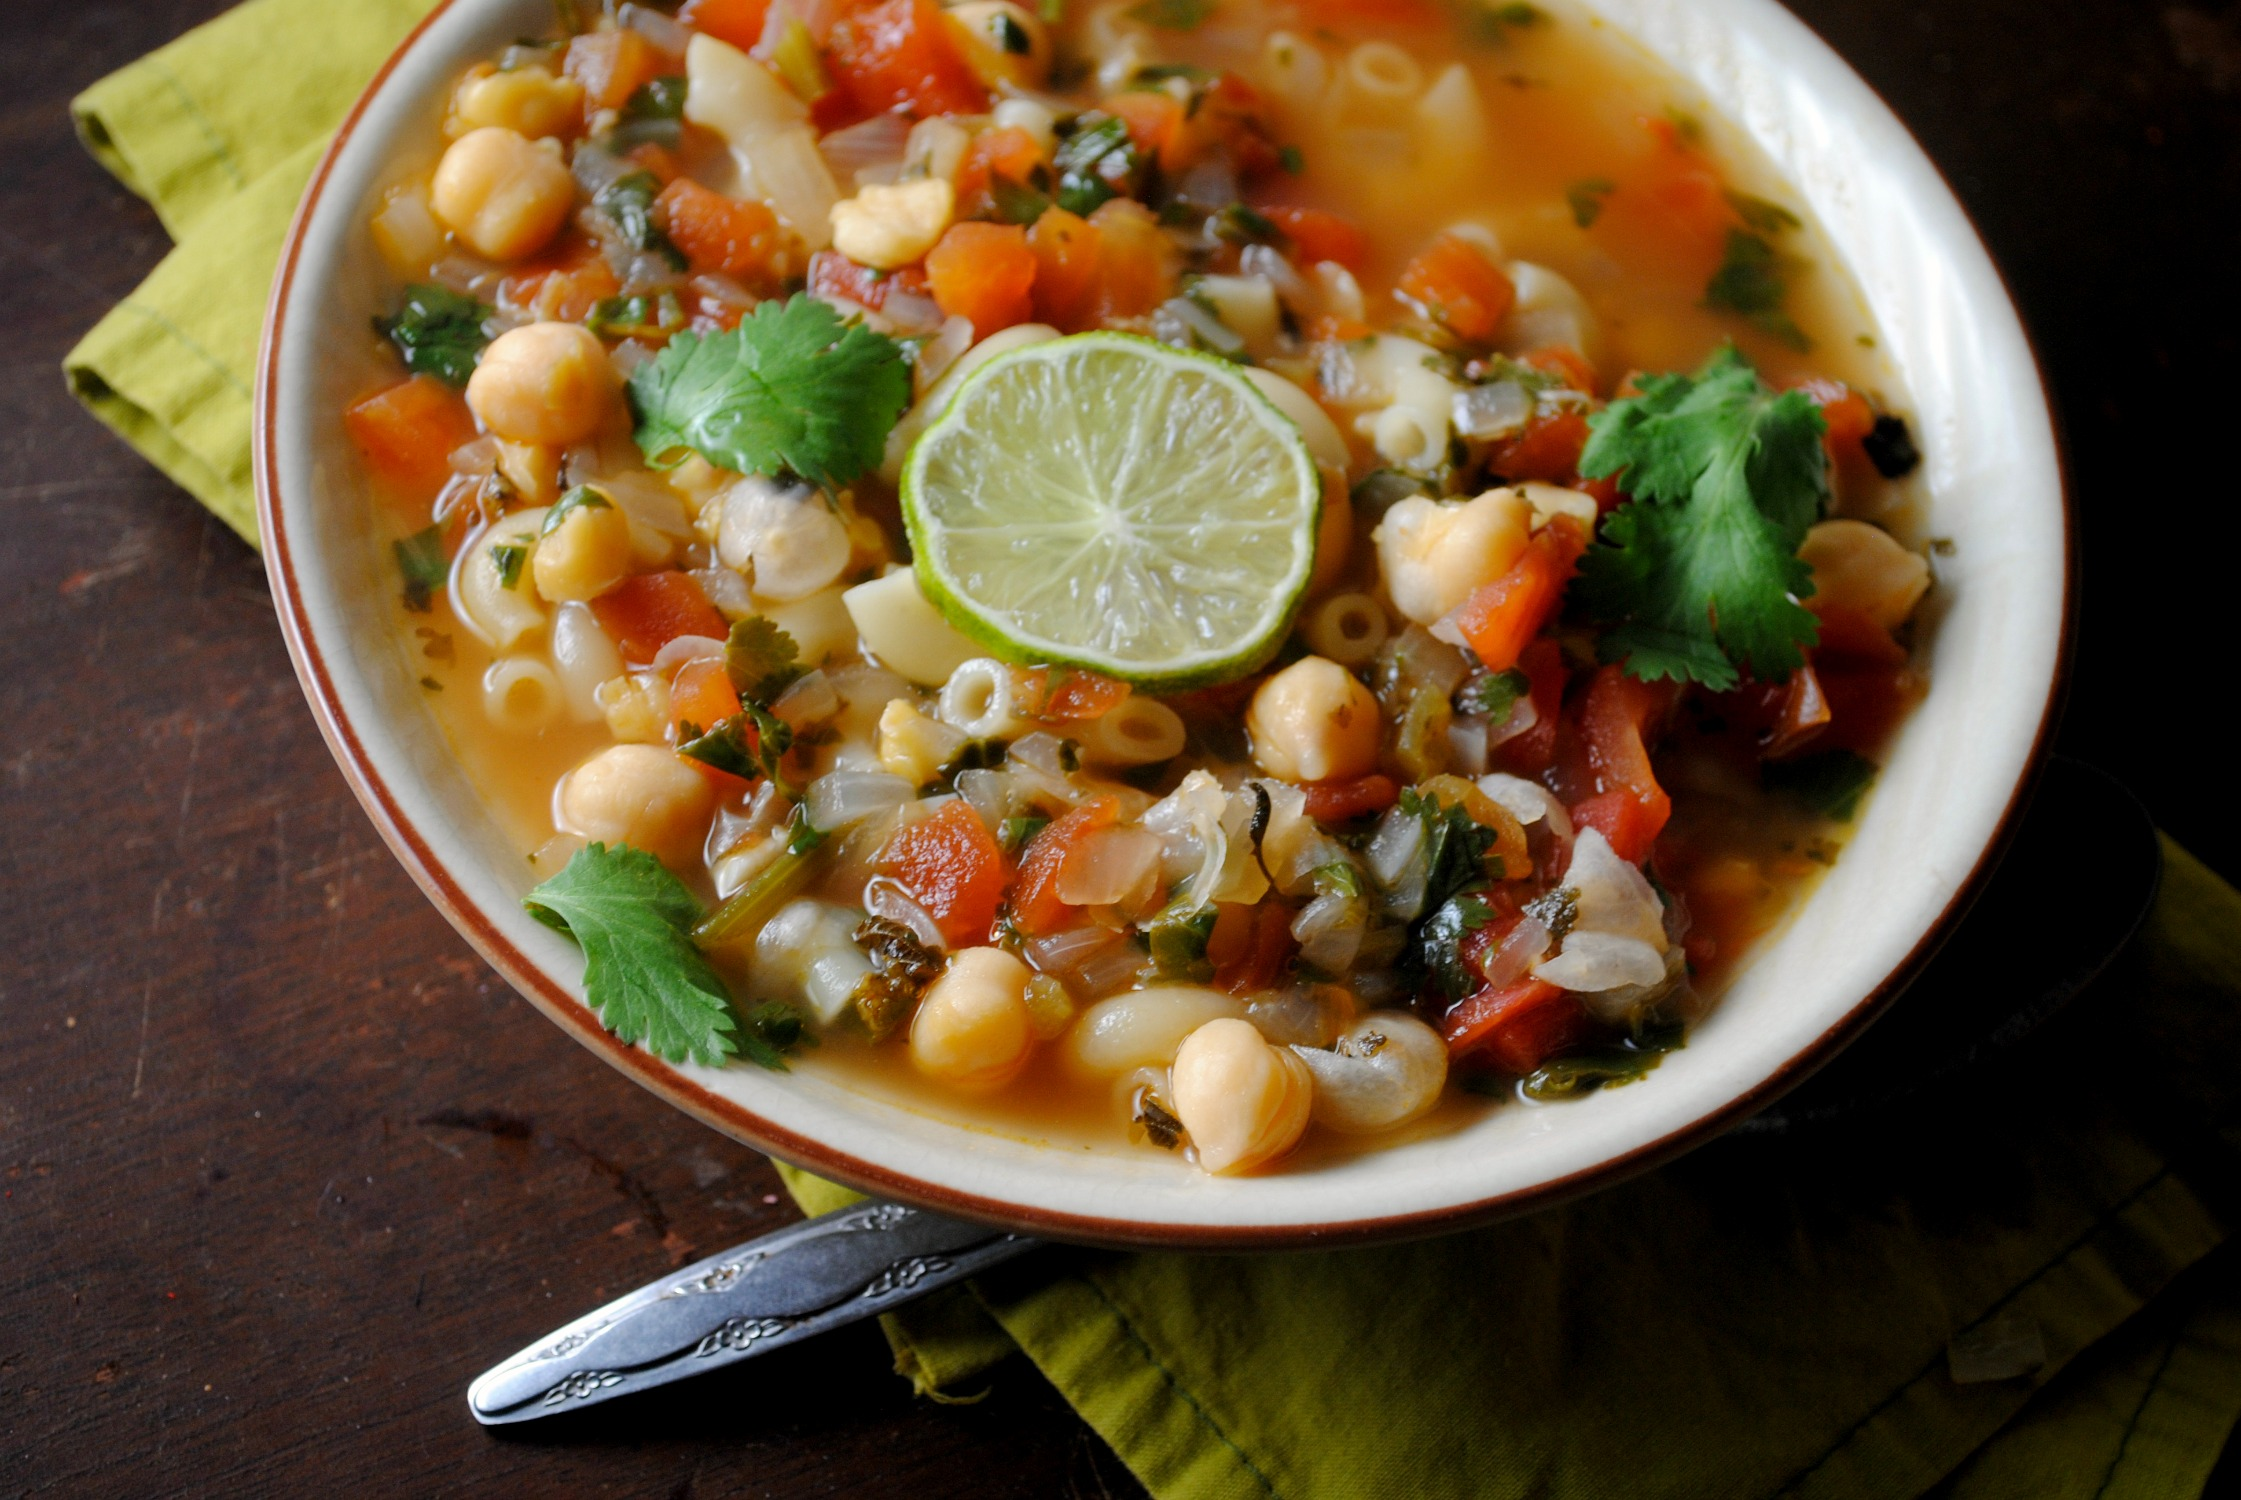 hearty-garbanzo- soup-VianneyRodriguez-sweetlifebake